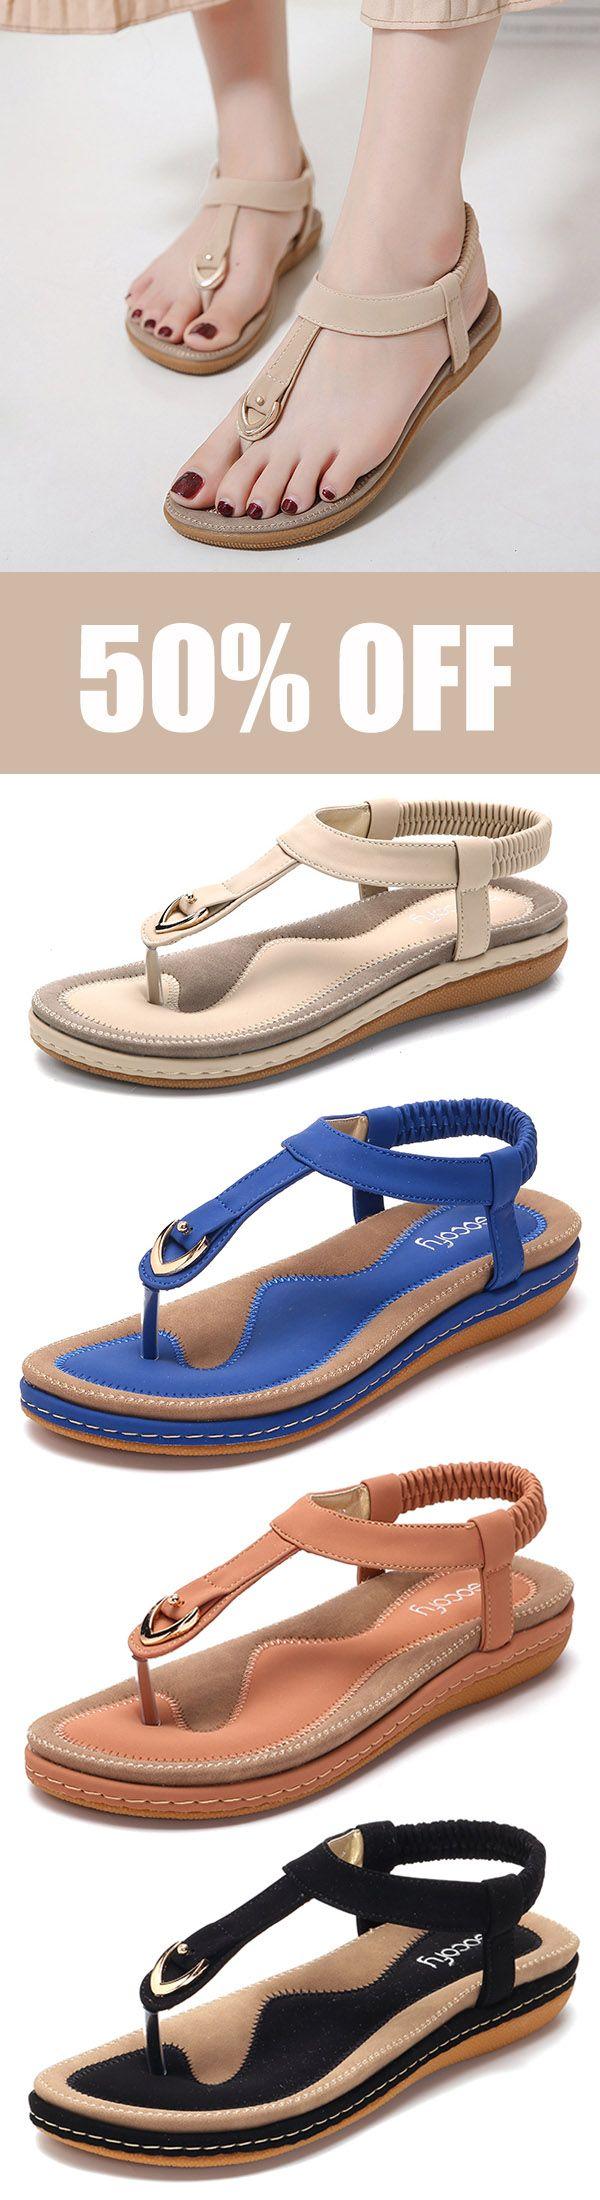 363e36bd0e66 SOCOFY Comfortable Shoes Elastic Clip Toe Flat Beach Sandals US Size 5-13.   shoes